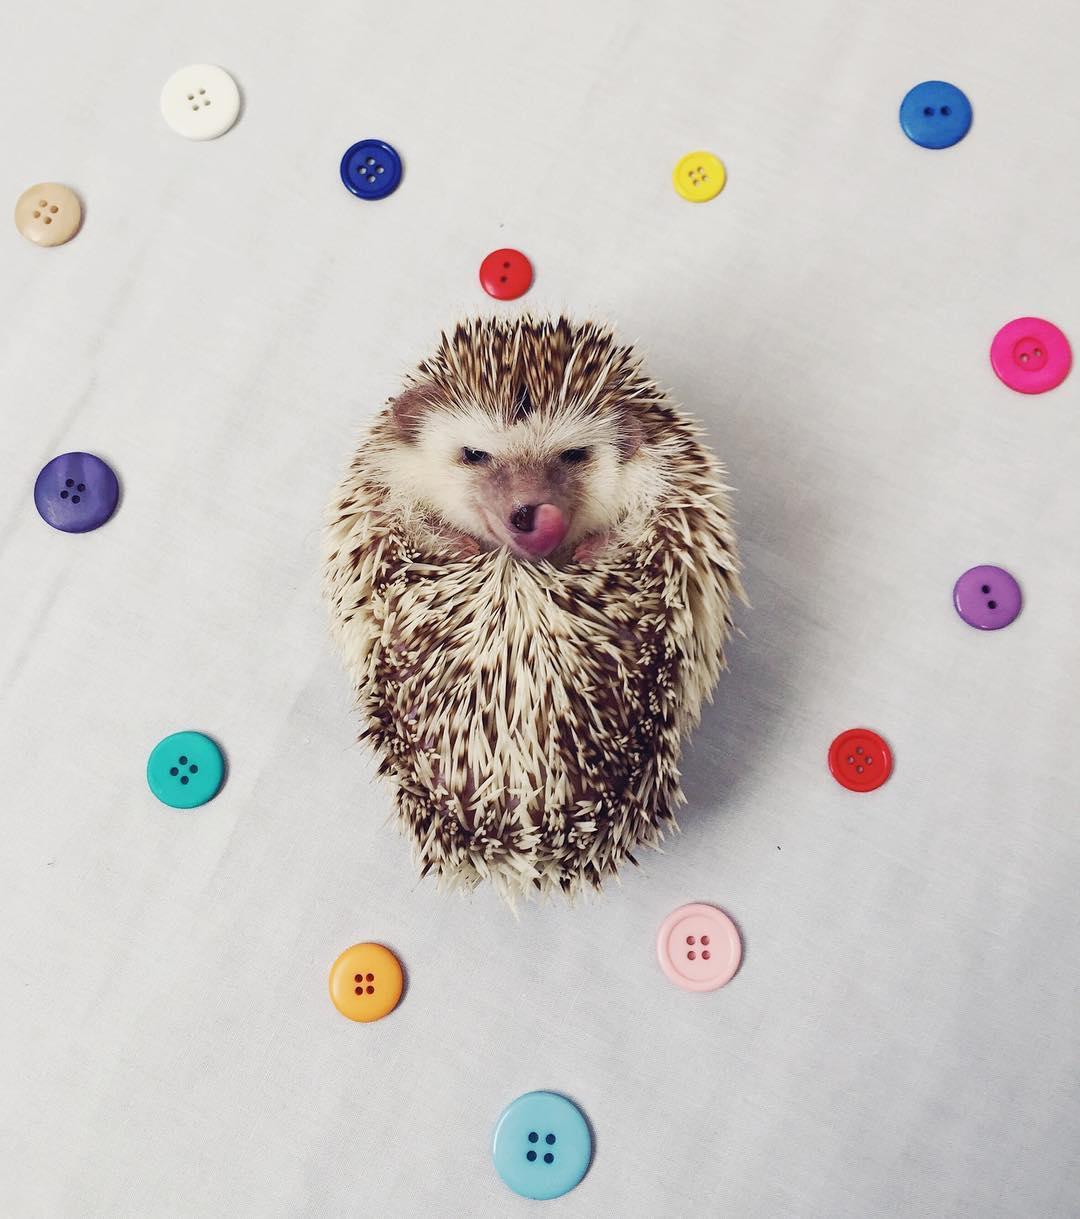 vampire-hedgehog-fangs-hodge-huffington-22